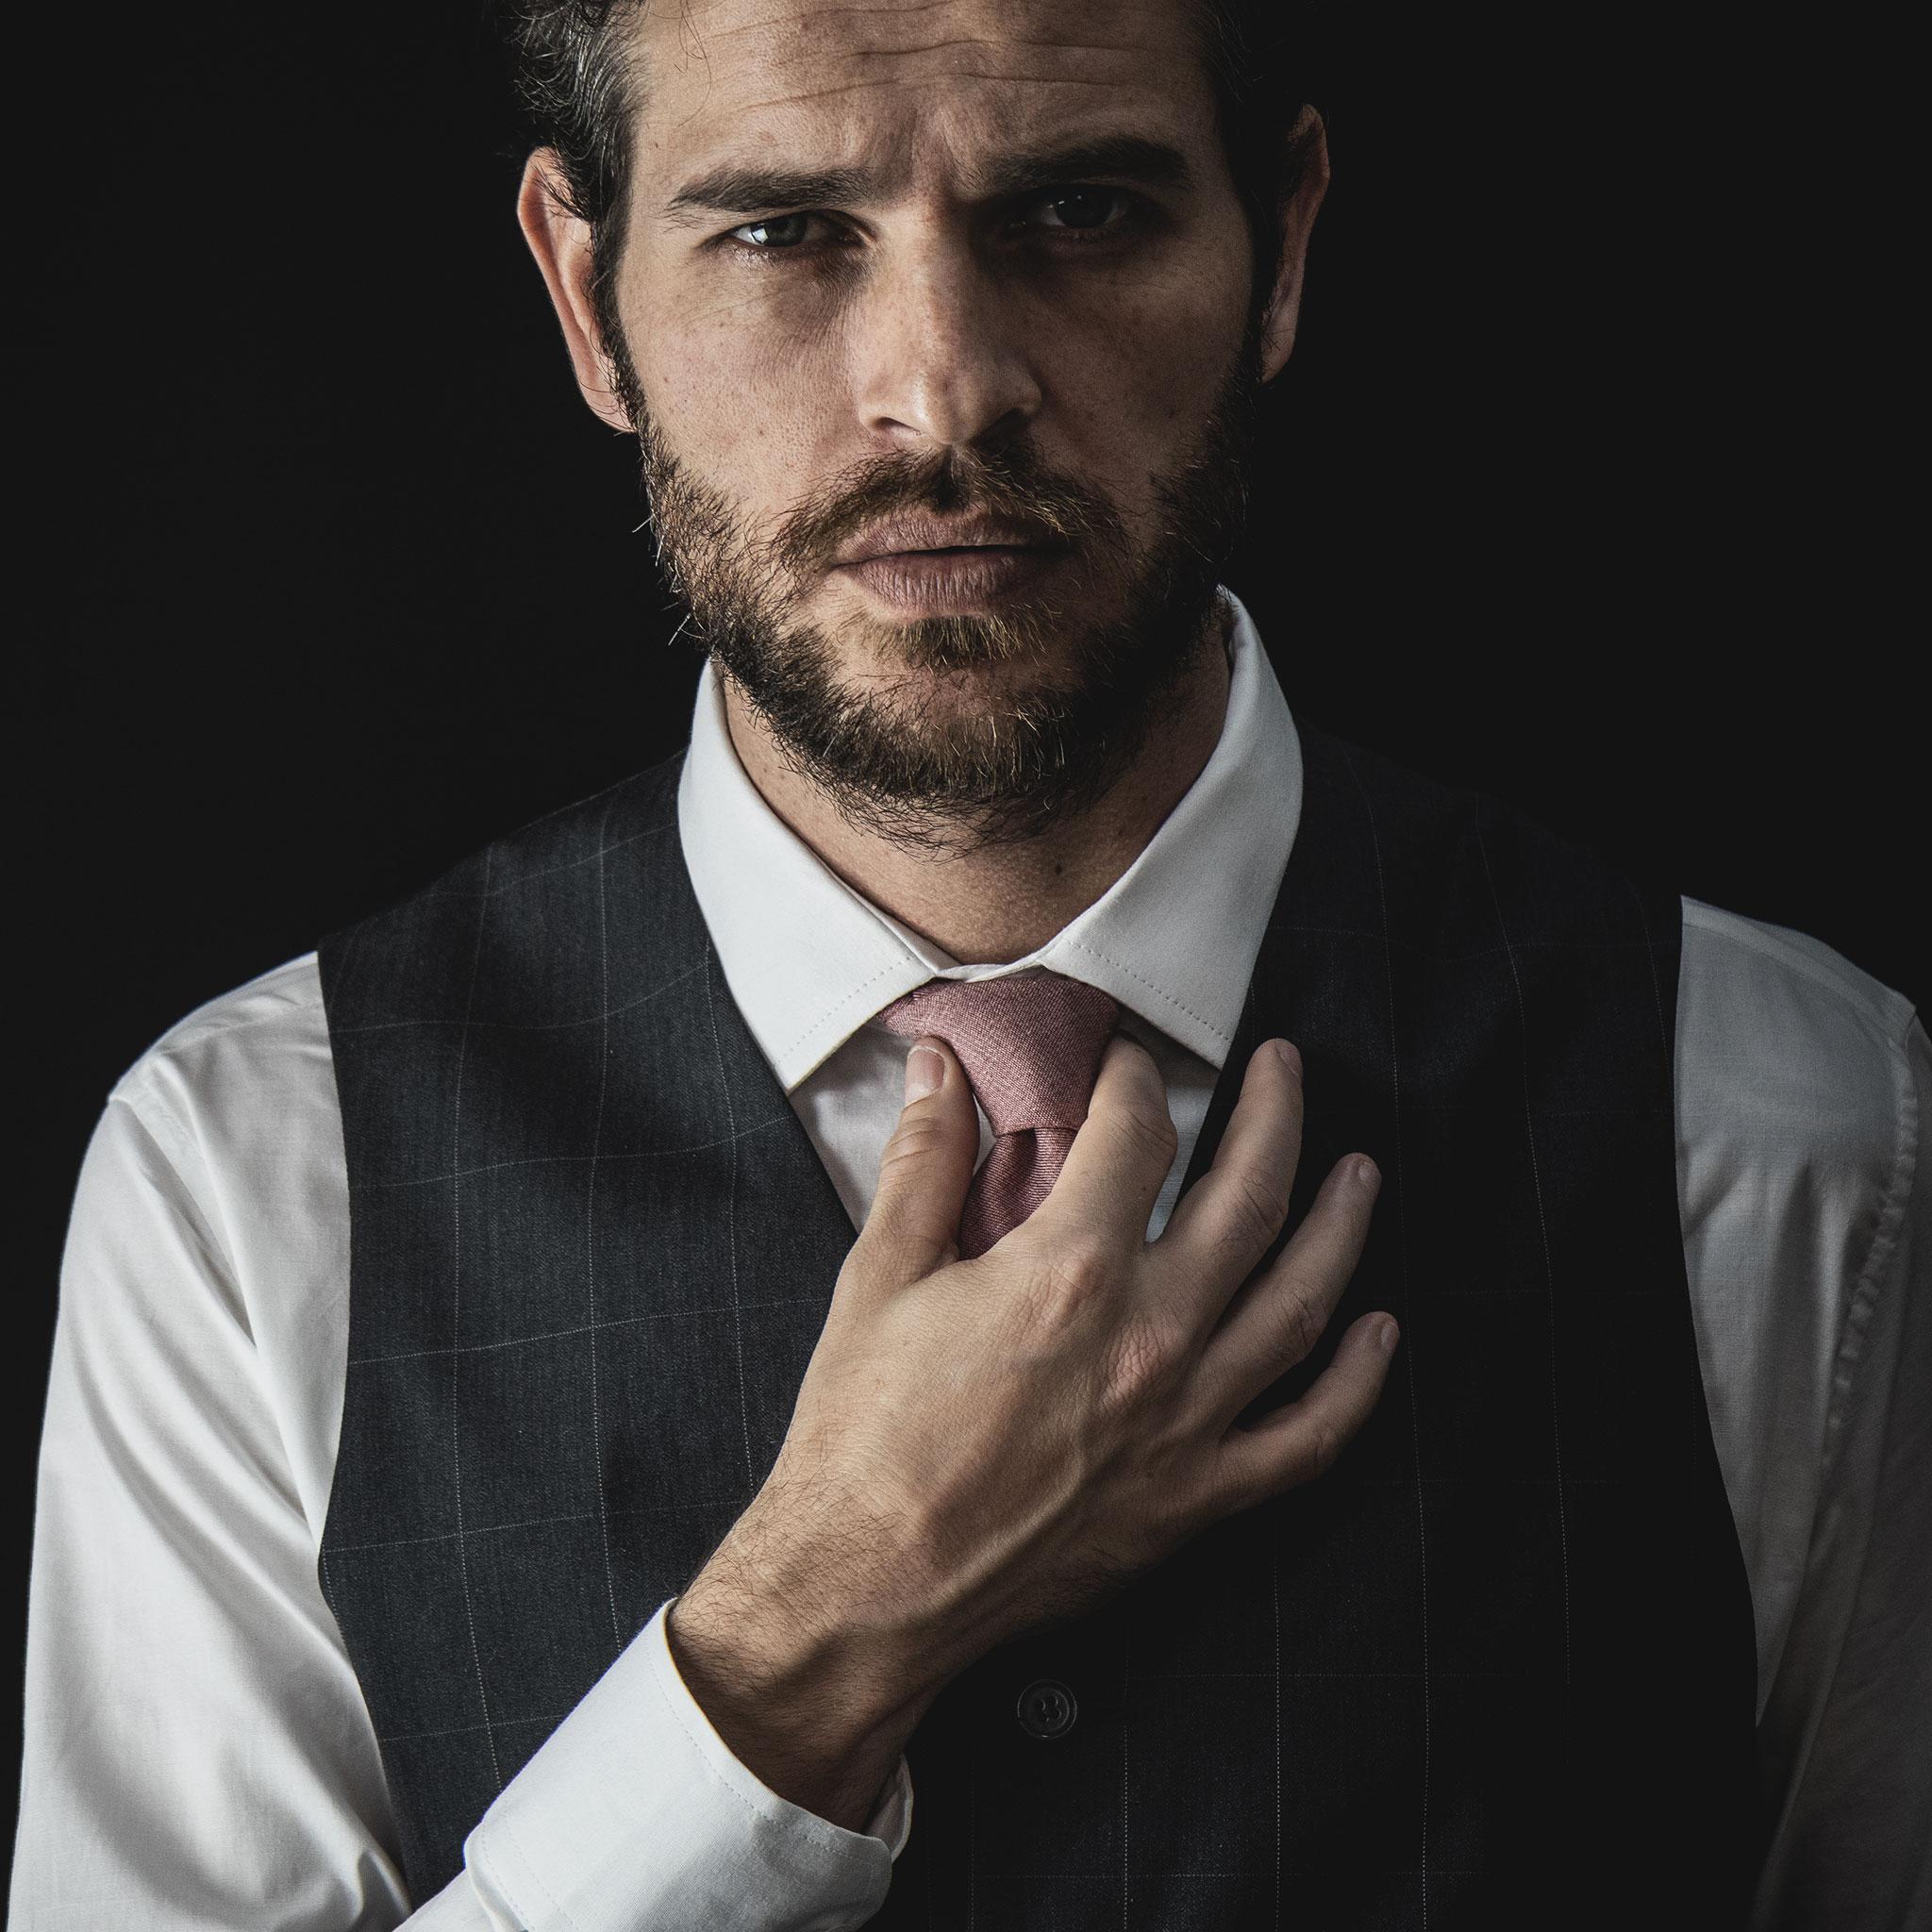 tipos de gravata